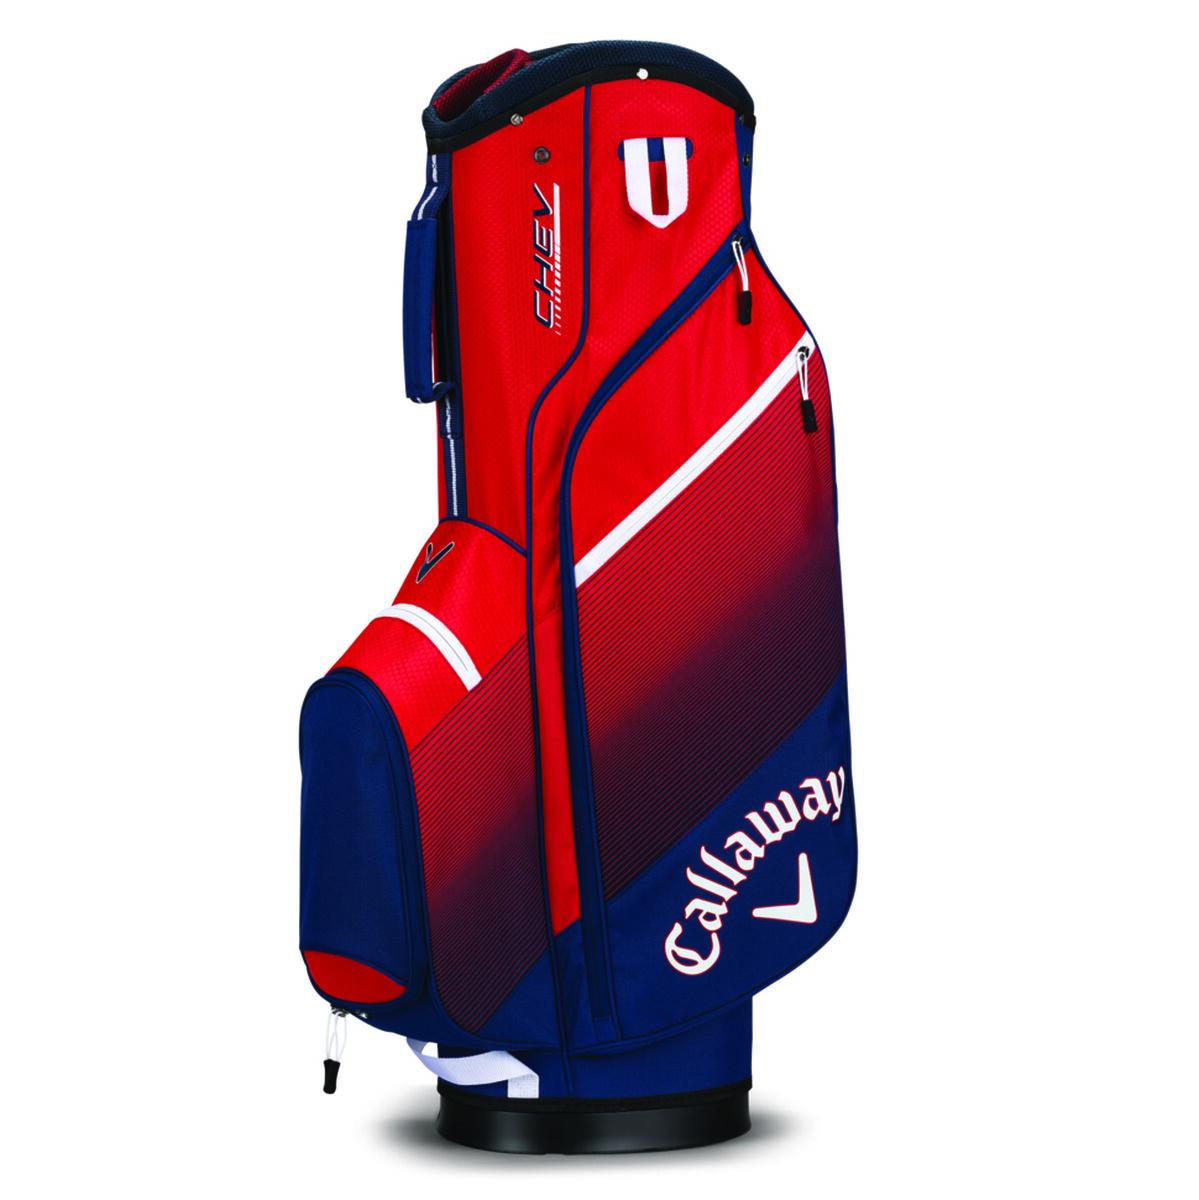 Callaway Chev Cart Bag on callaway org xt cart bag, callaway cart golf bag cooler, callaway carry golf bags, callaway org 14s cart bag, callaway 14 sport cart bag,